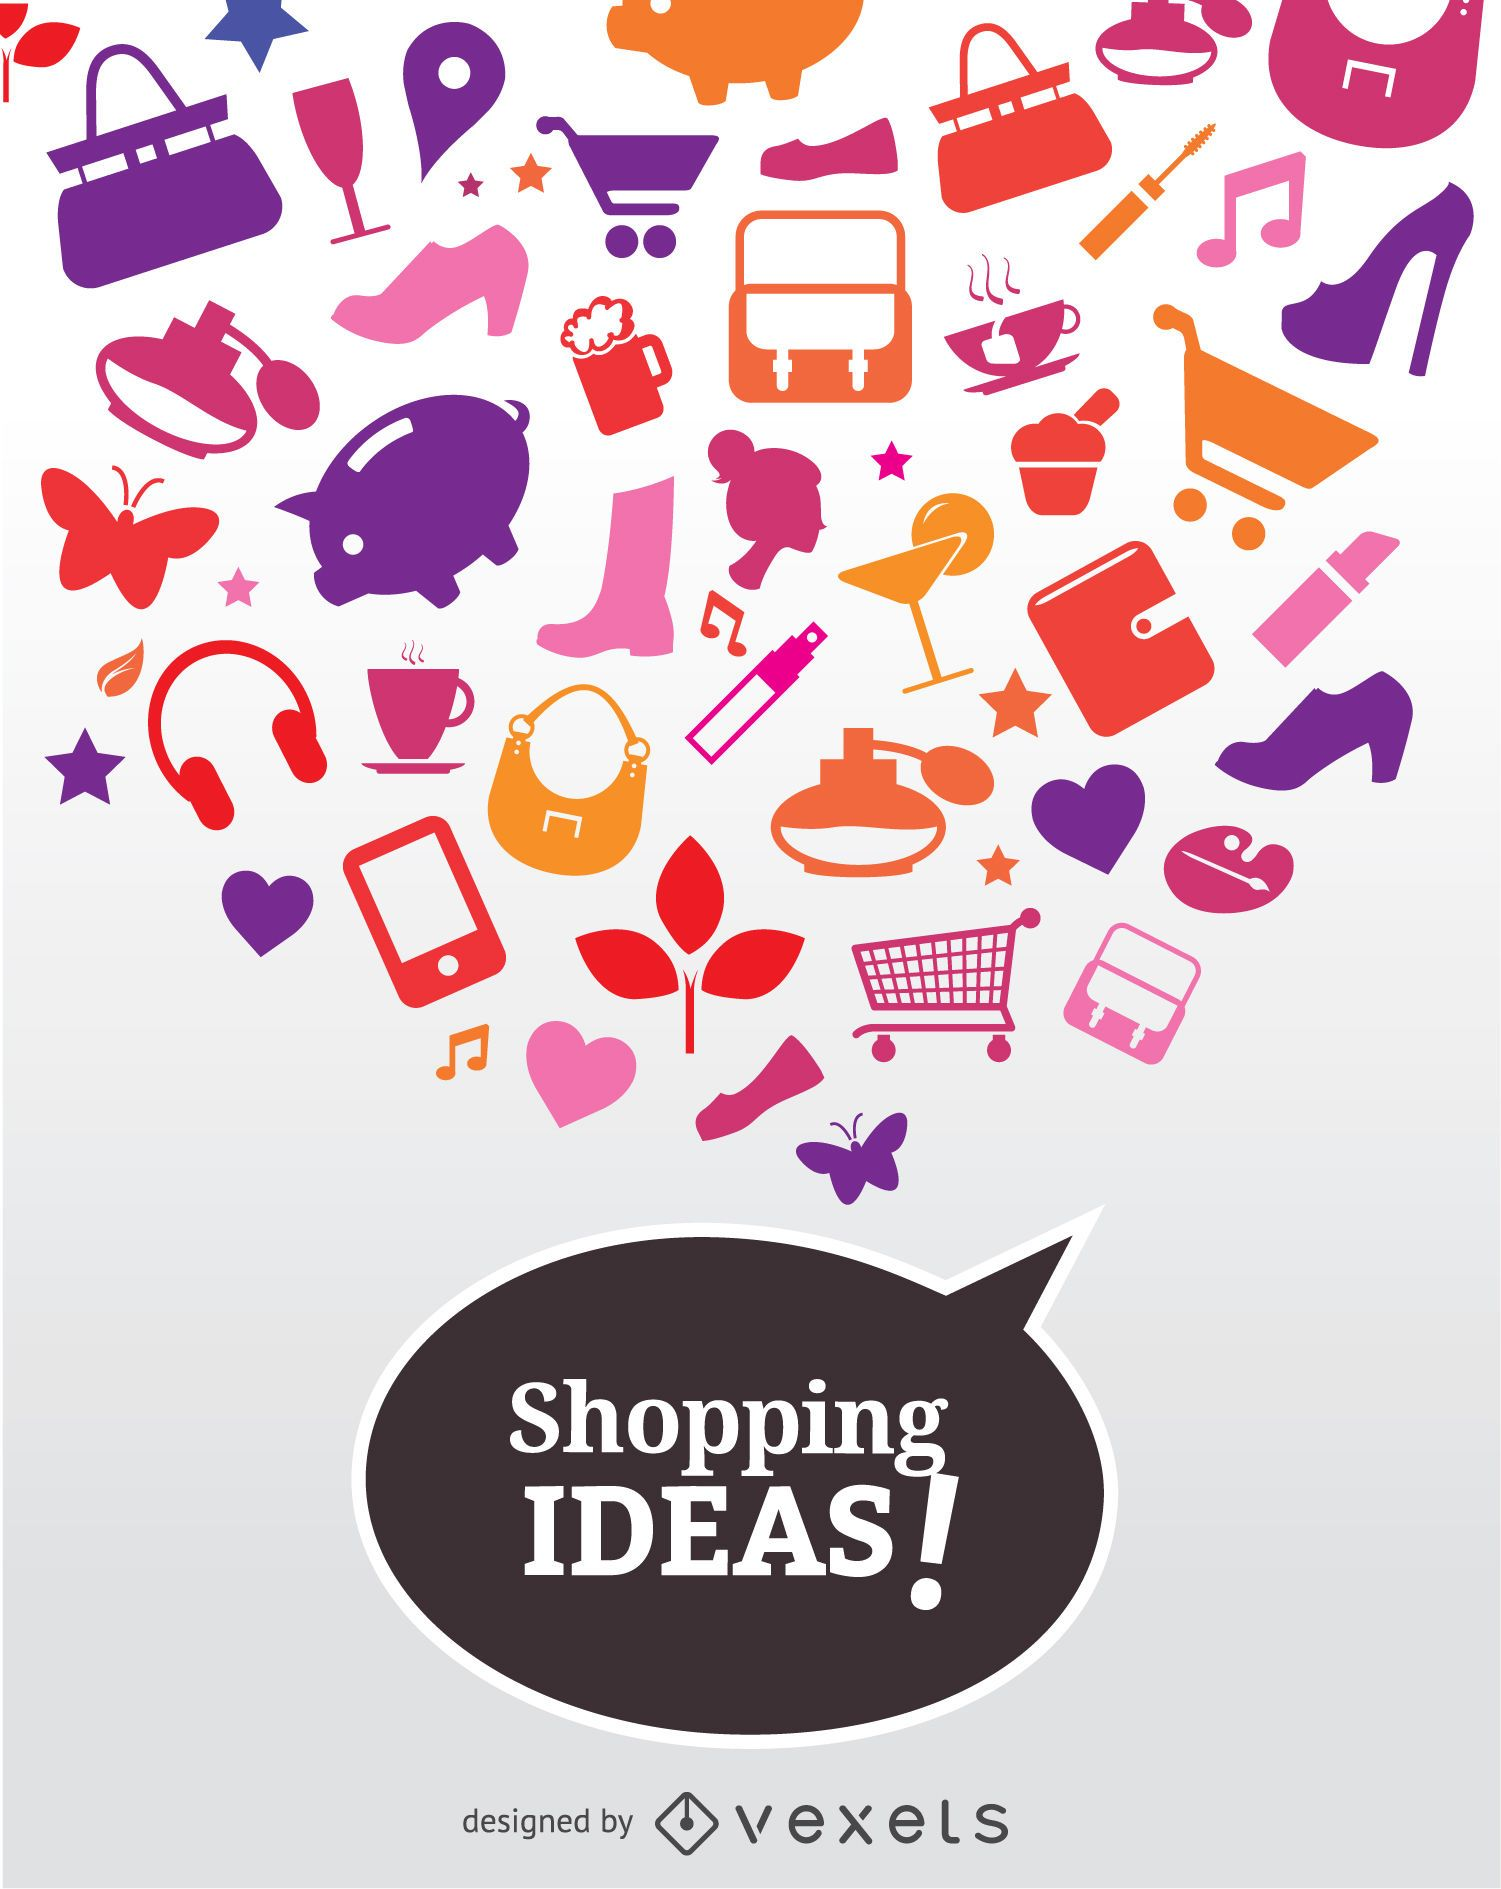 Cartaz de ícones de ideias de compras